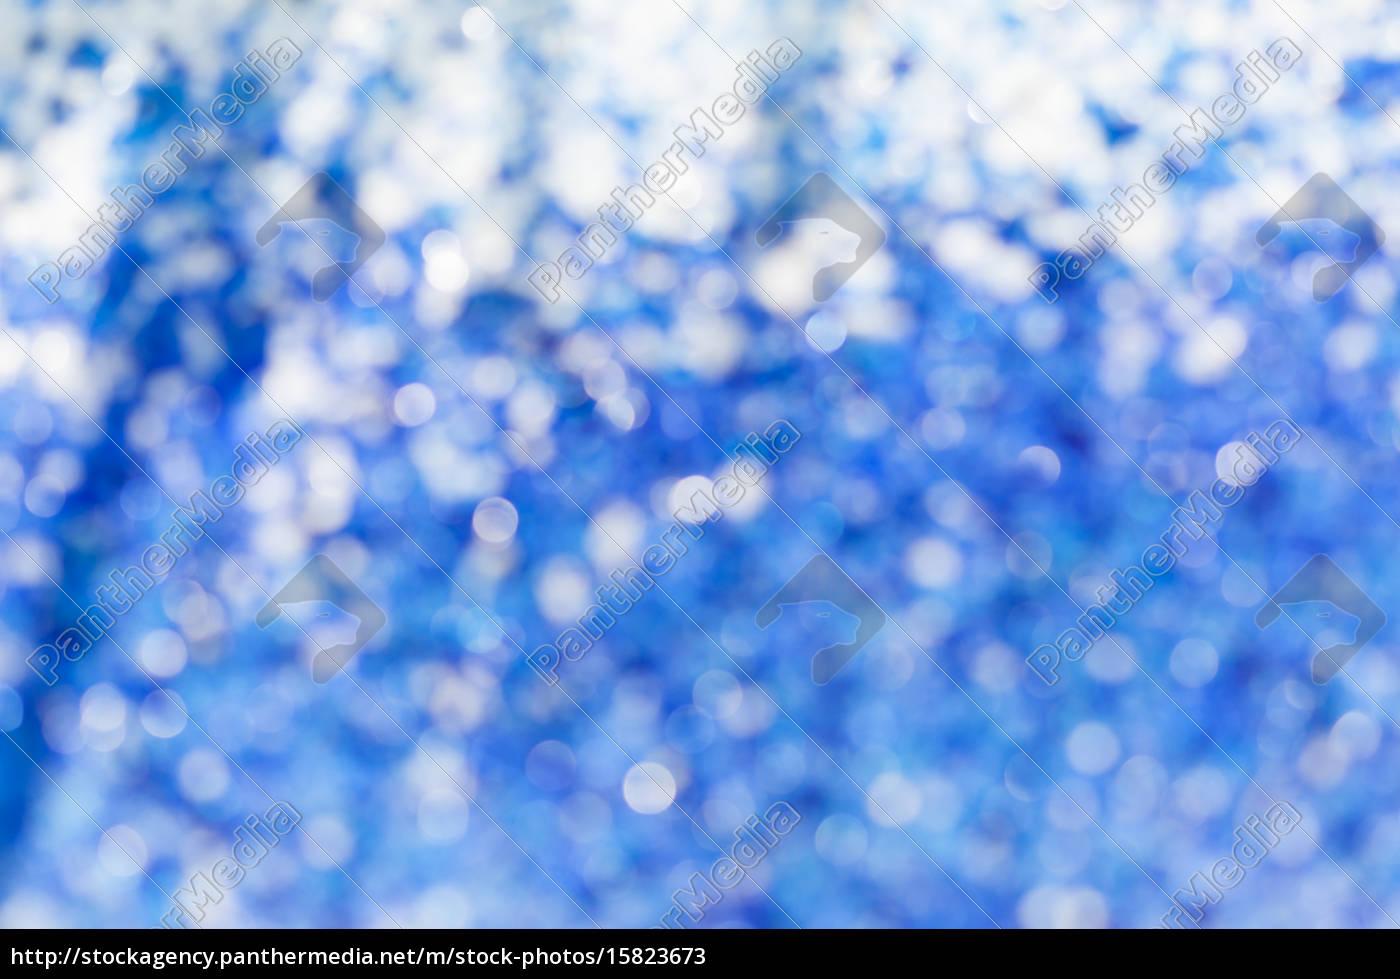 blue, blurred, background - 15823673